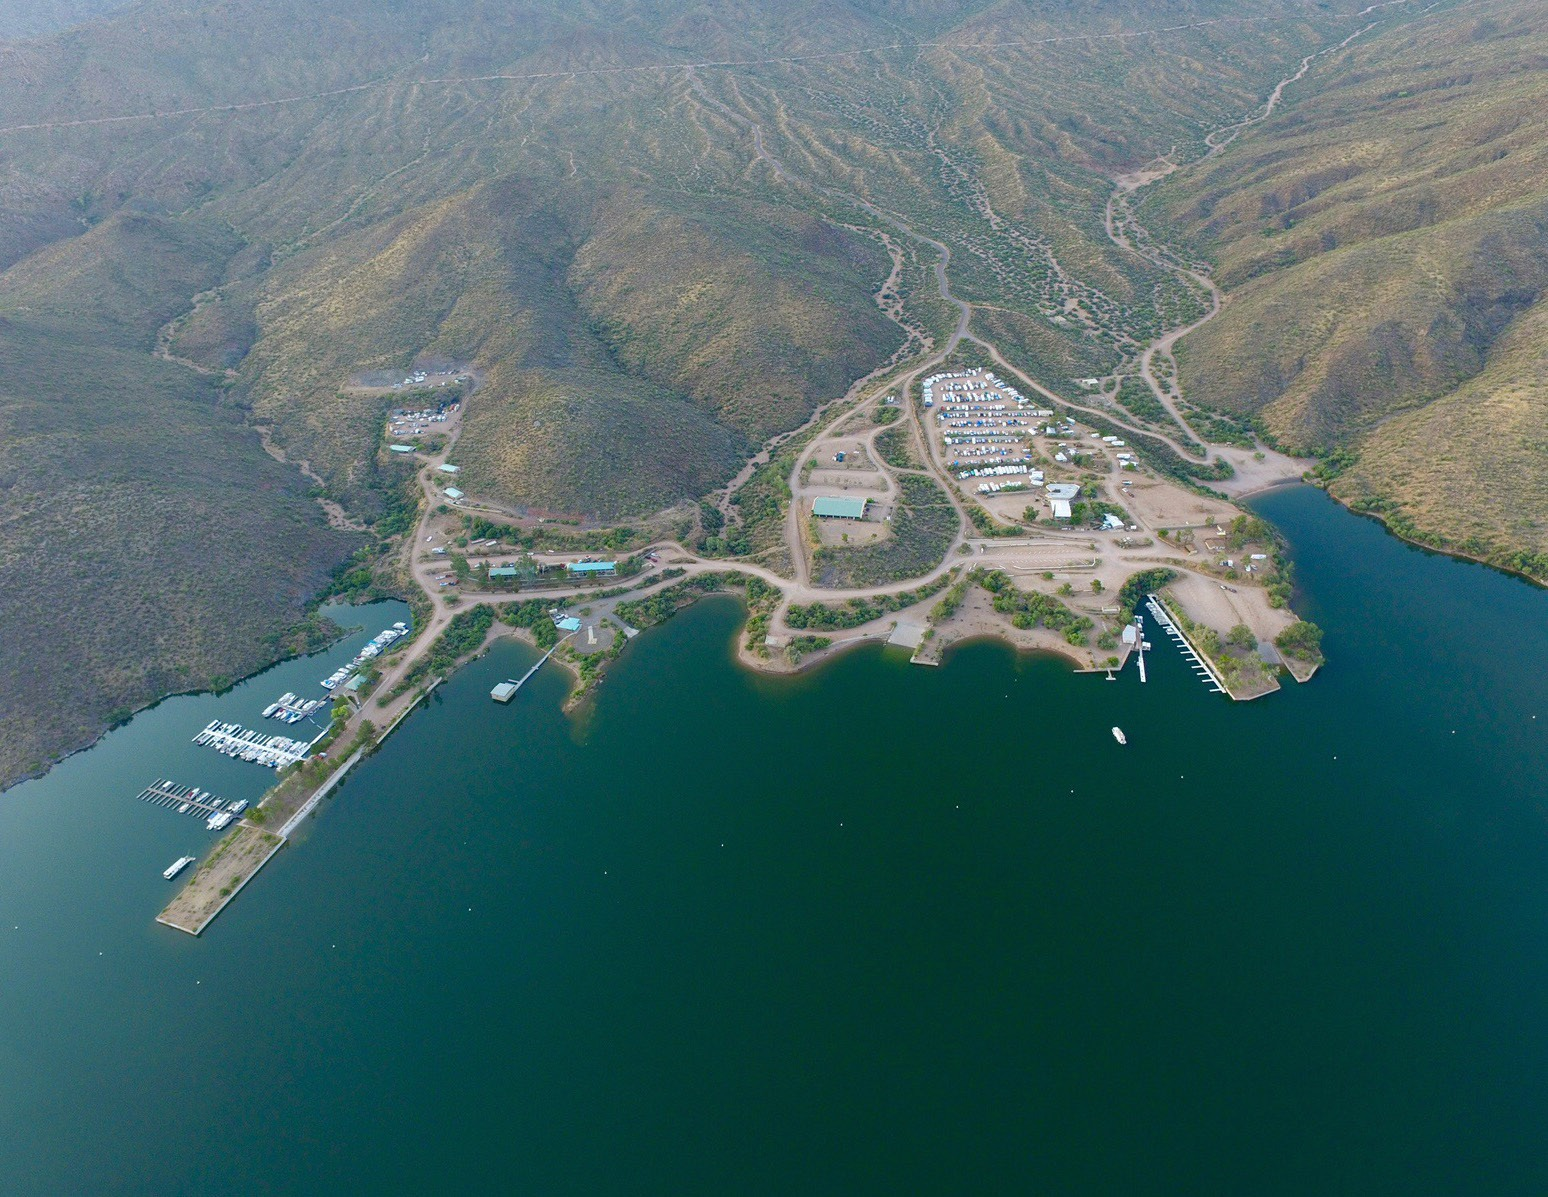 20909 Apache Lake Resort and Marina, Apache Junction AZ 85119 Specialty Resort